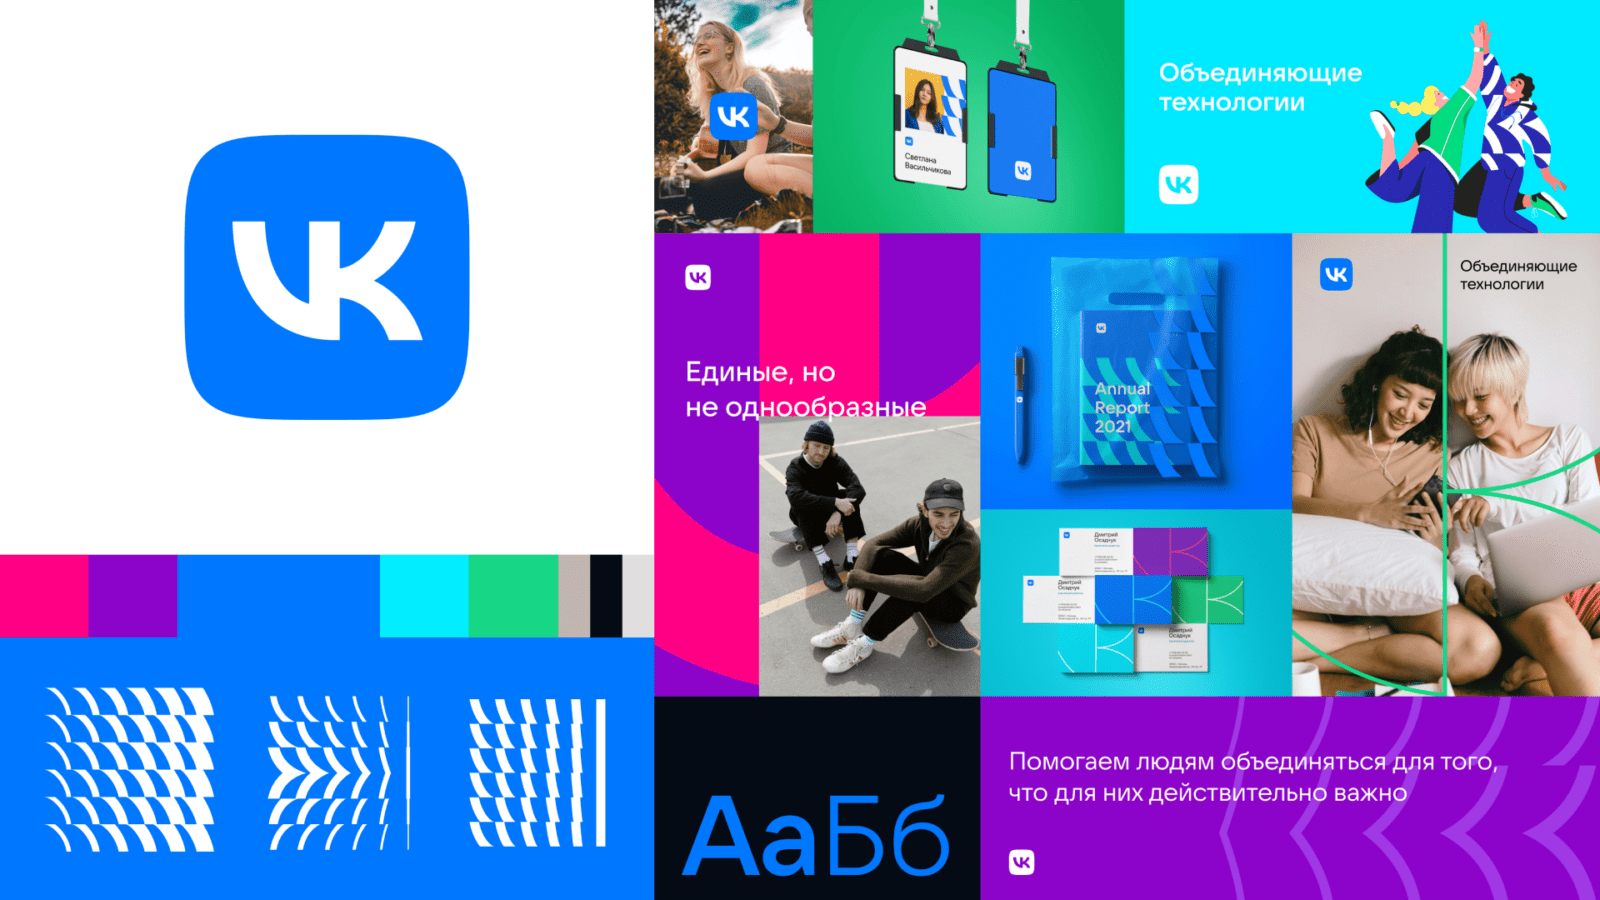 Mail.Ru Group переименовали в VK (9. illyustratsii 42)